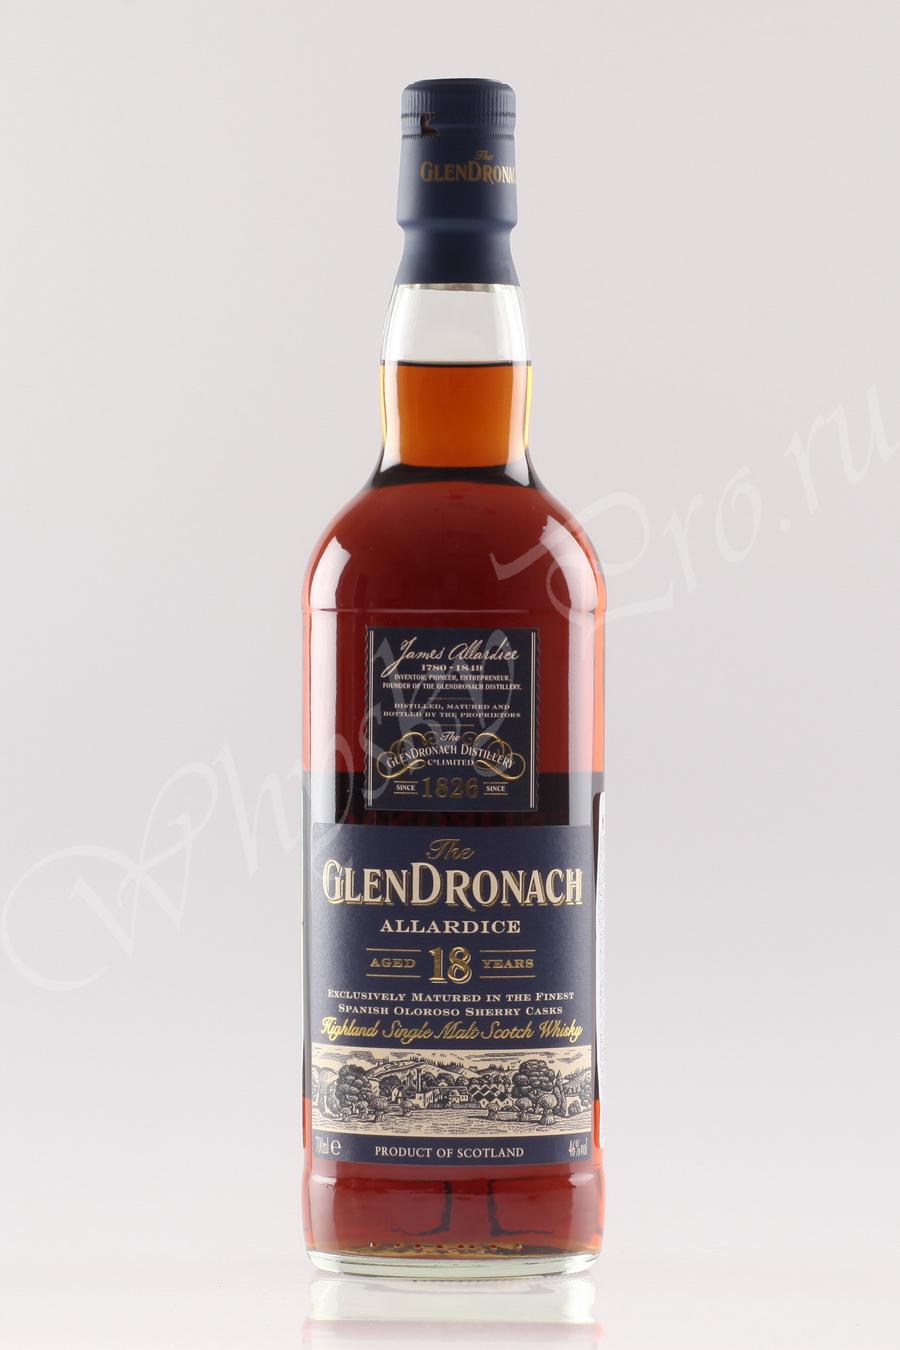 GlenDronach 18 years